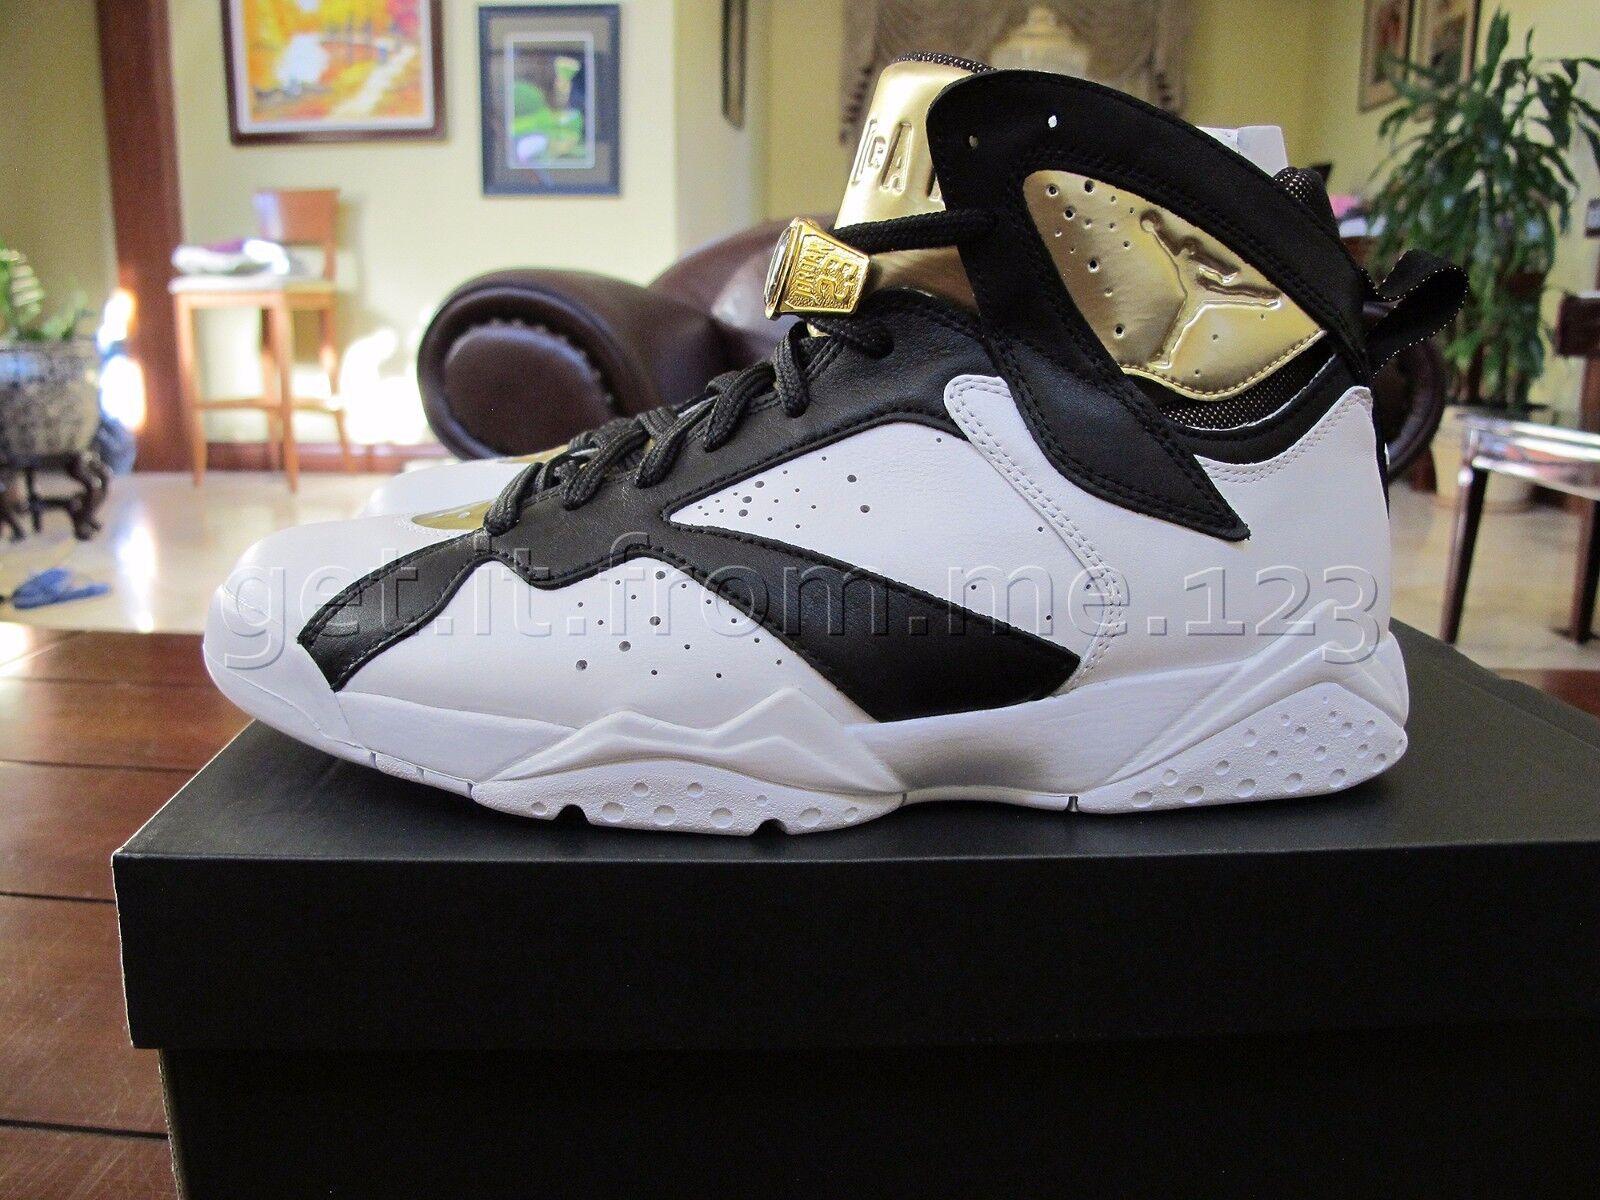 NIB Nike Air Jordan Retro VII 7 Gold C&C Champagne Size 9 Gold 7 White Black 725093 140 edfeae